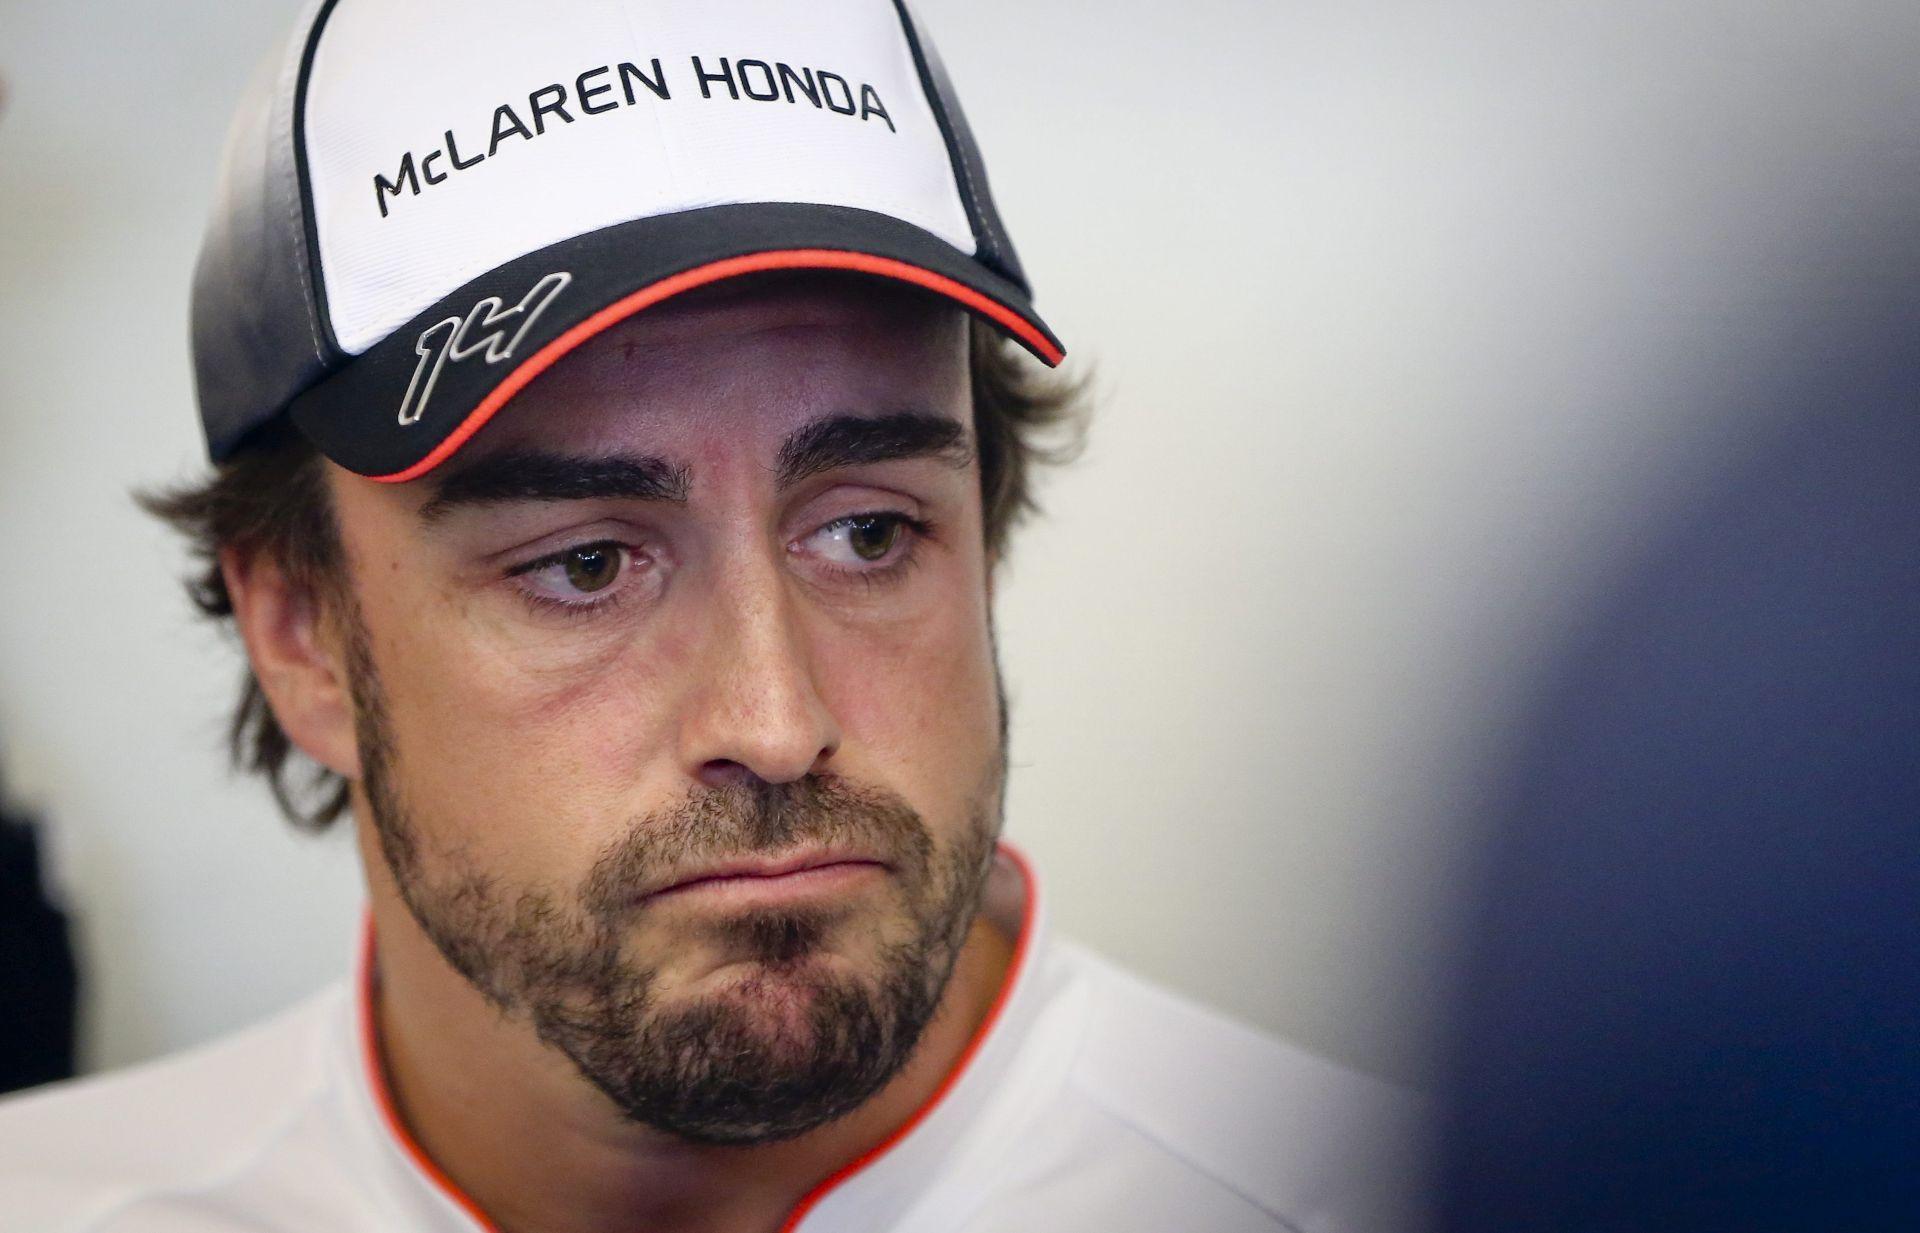 VELIKA NAGRADA KINE Fernando Alonso dobio privremeno 'zeleno svjetlo' za nastup